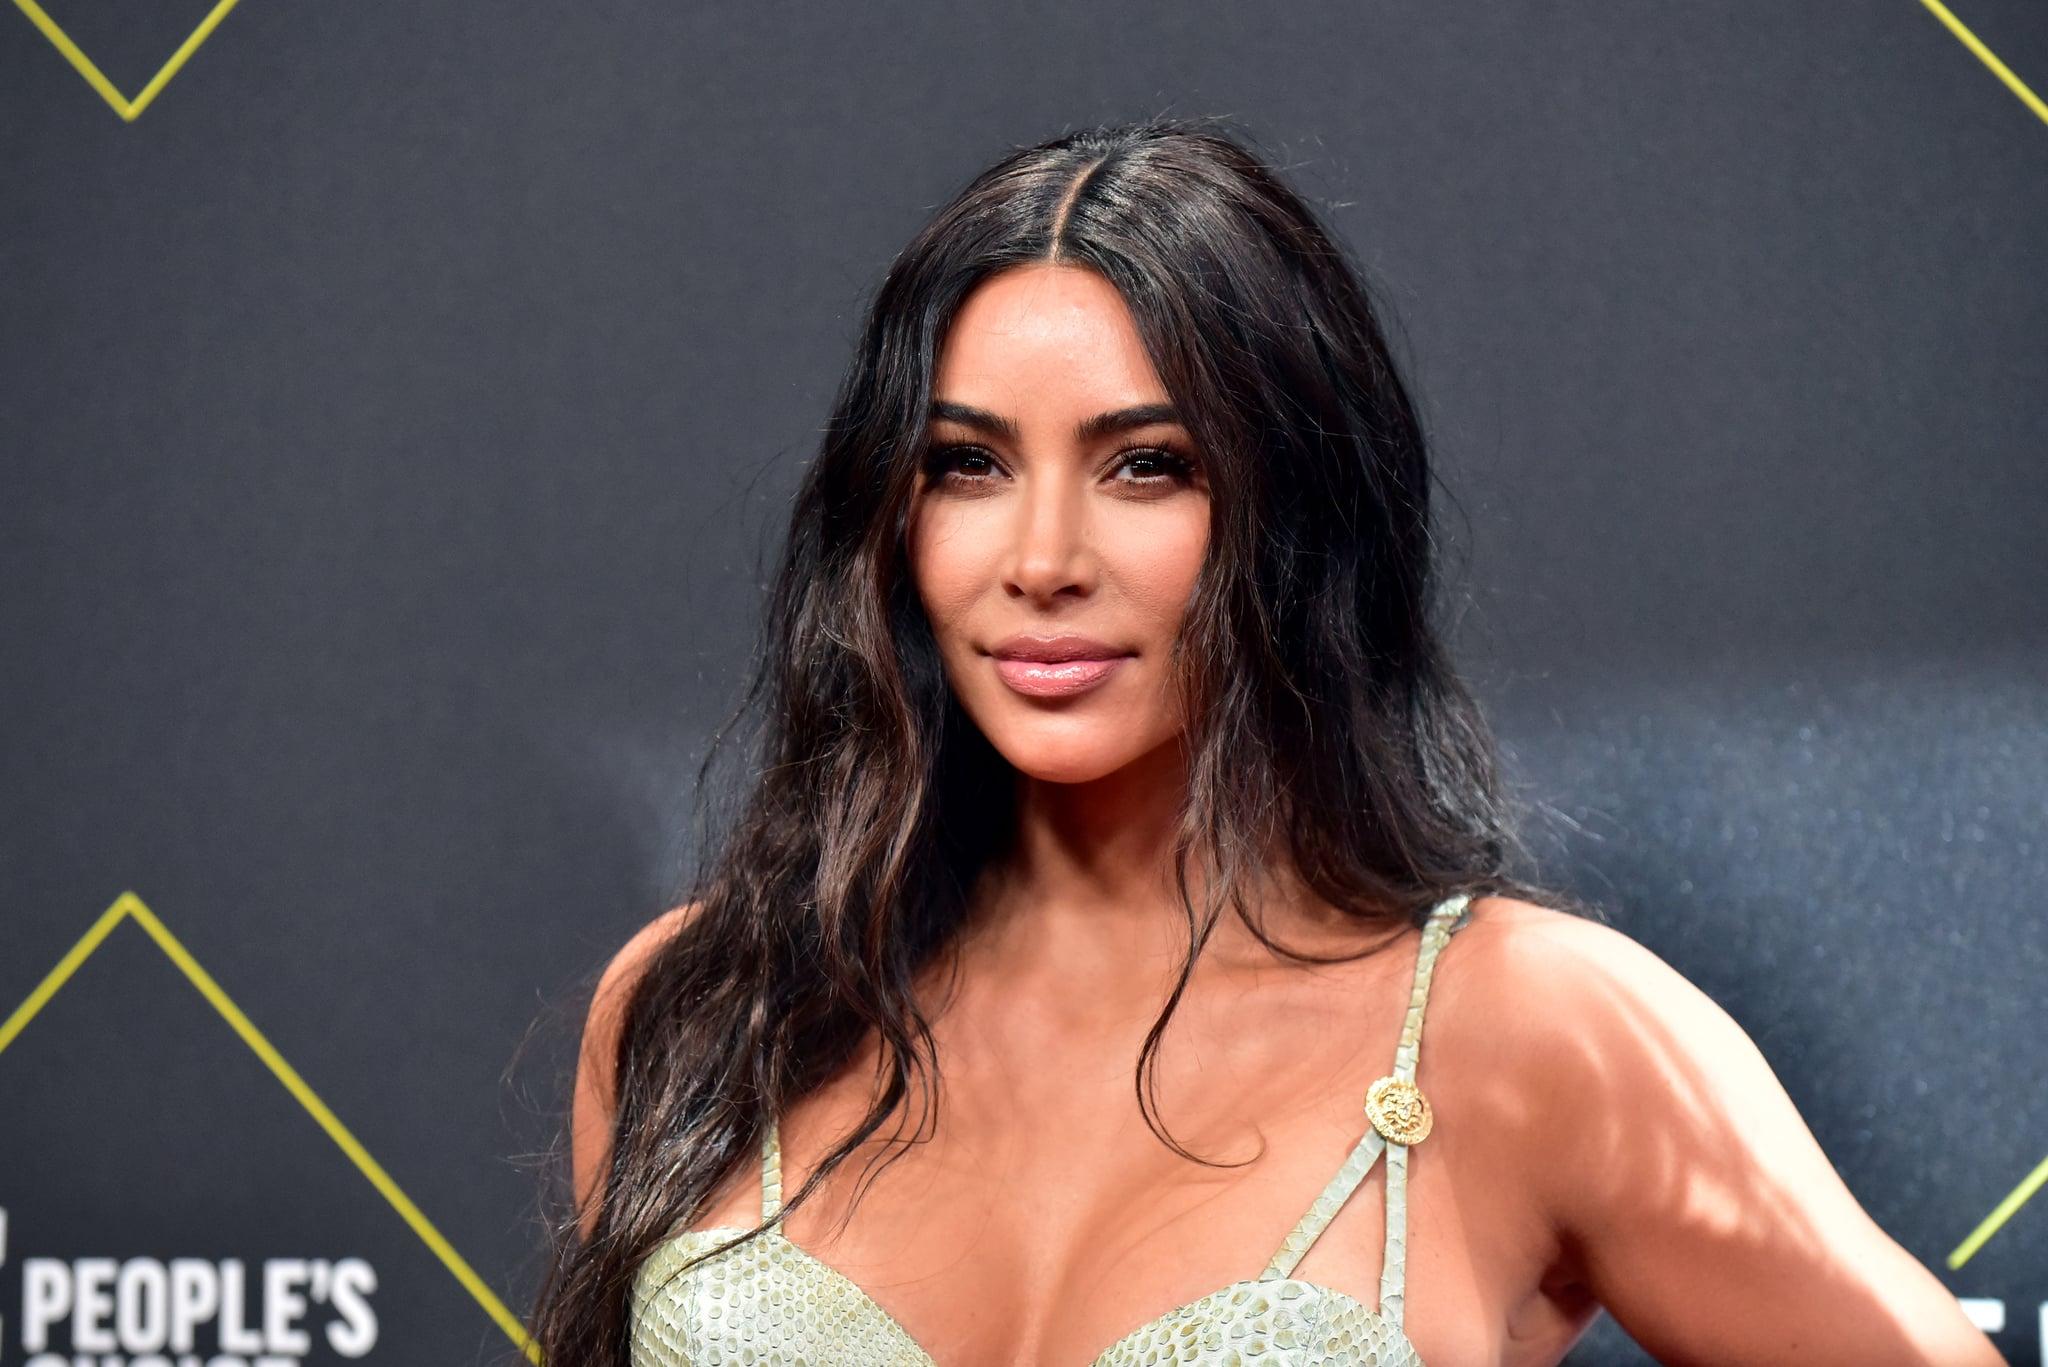 SANTA MONICA, CALIFORNIA - NOVEMBER 10: Kim Kardashian attends the 2019 E! People's Choice Awards at Barker Hangar on November 10, 2019 in Santa Monica, California. (Photo by Rodin Eckenroth/WireImage)